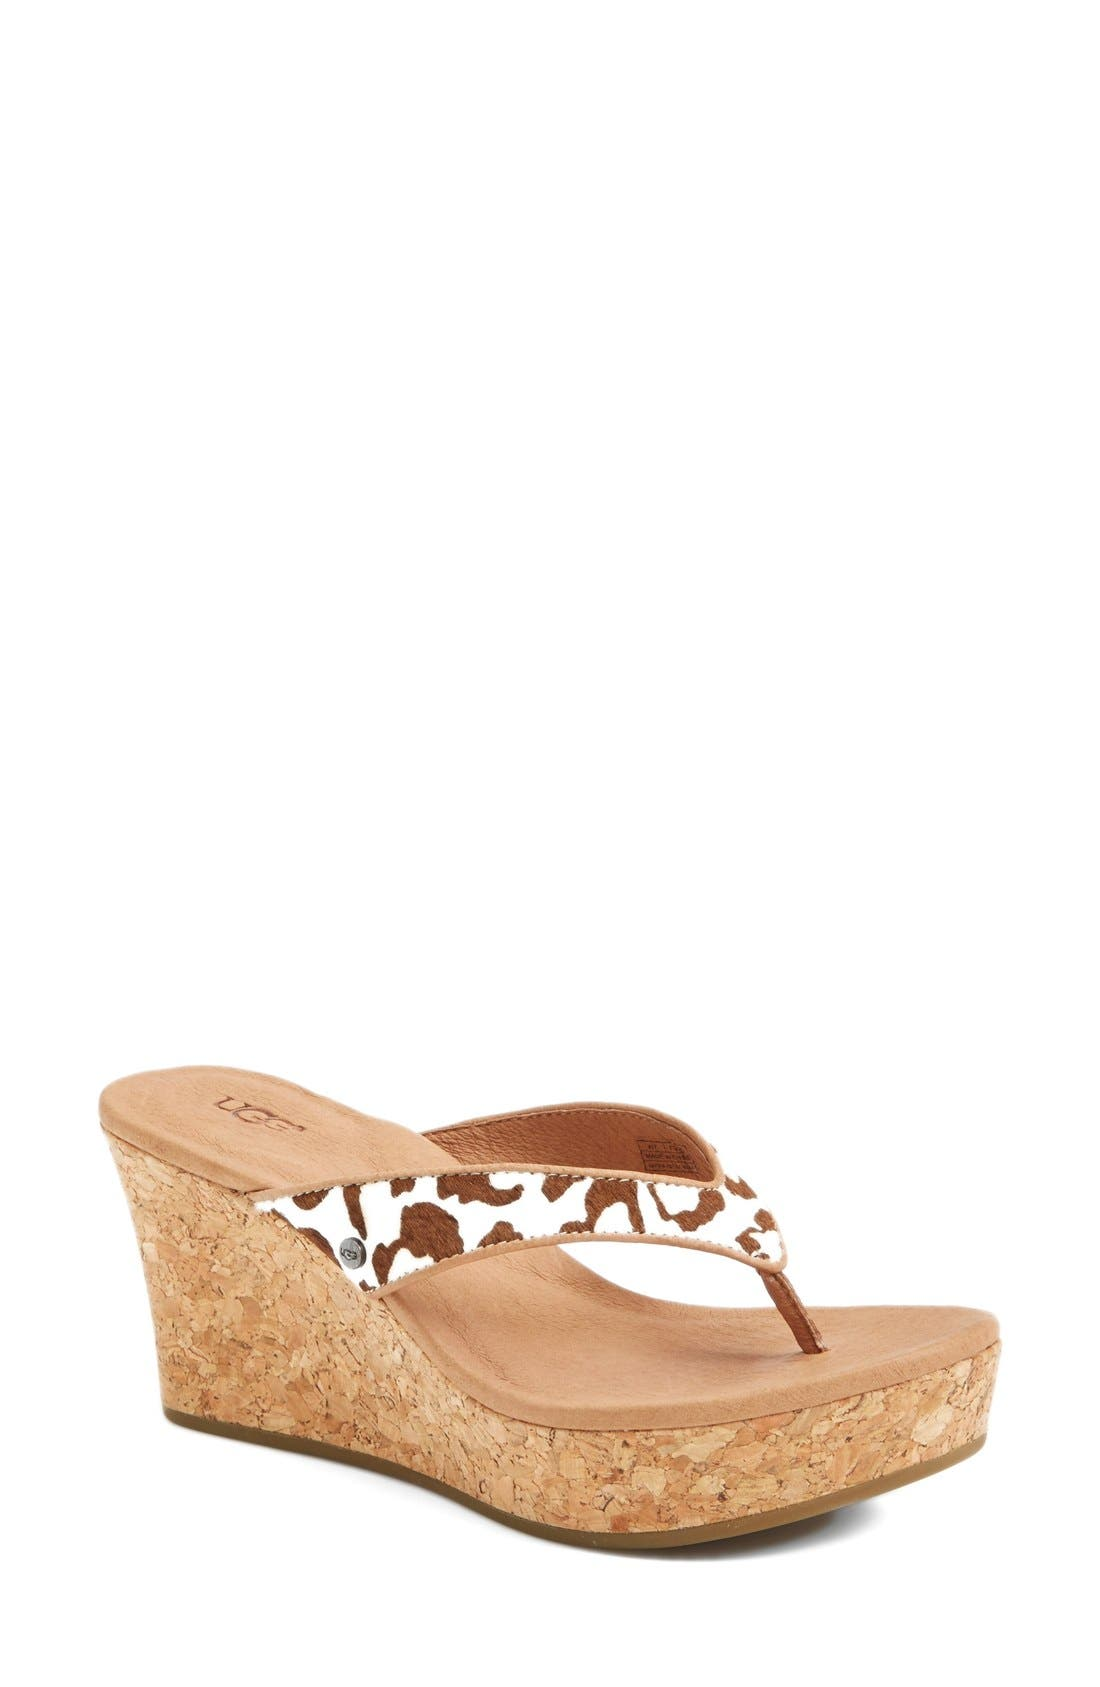 Alternate Image 1 Selected - UGG Australia 'Natassia' Calf Hair Wedge Sandal (Women)